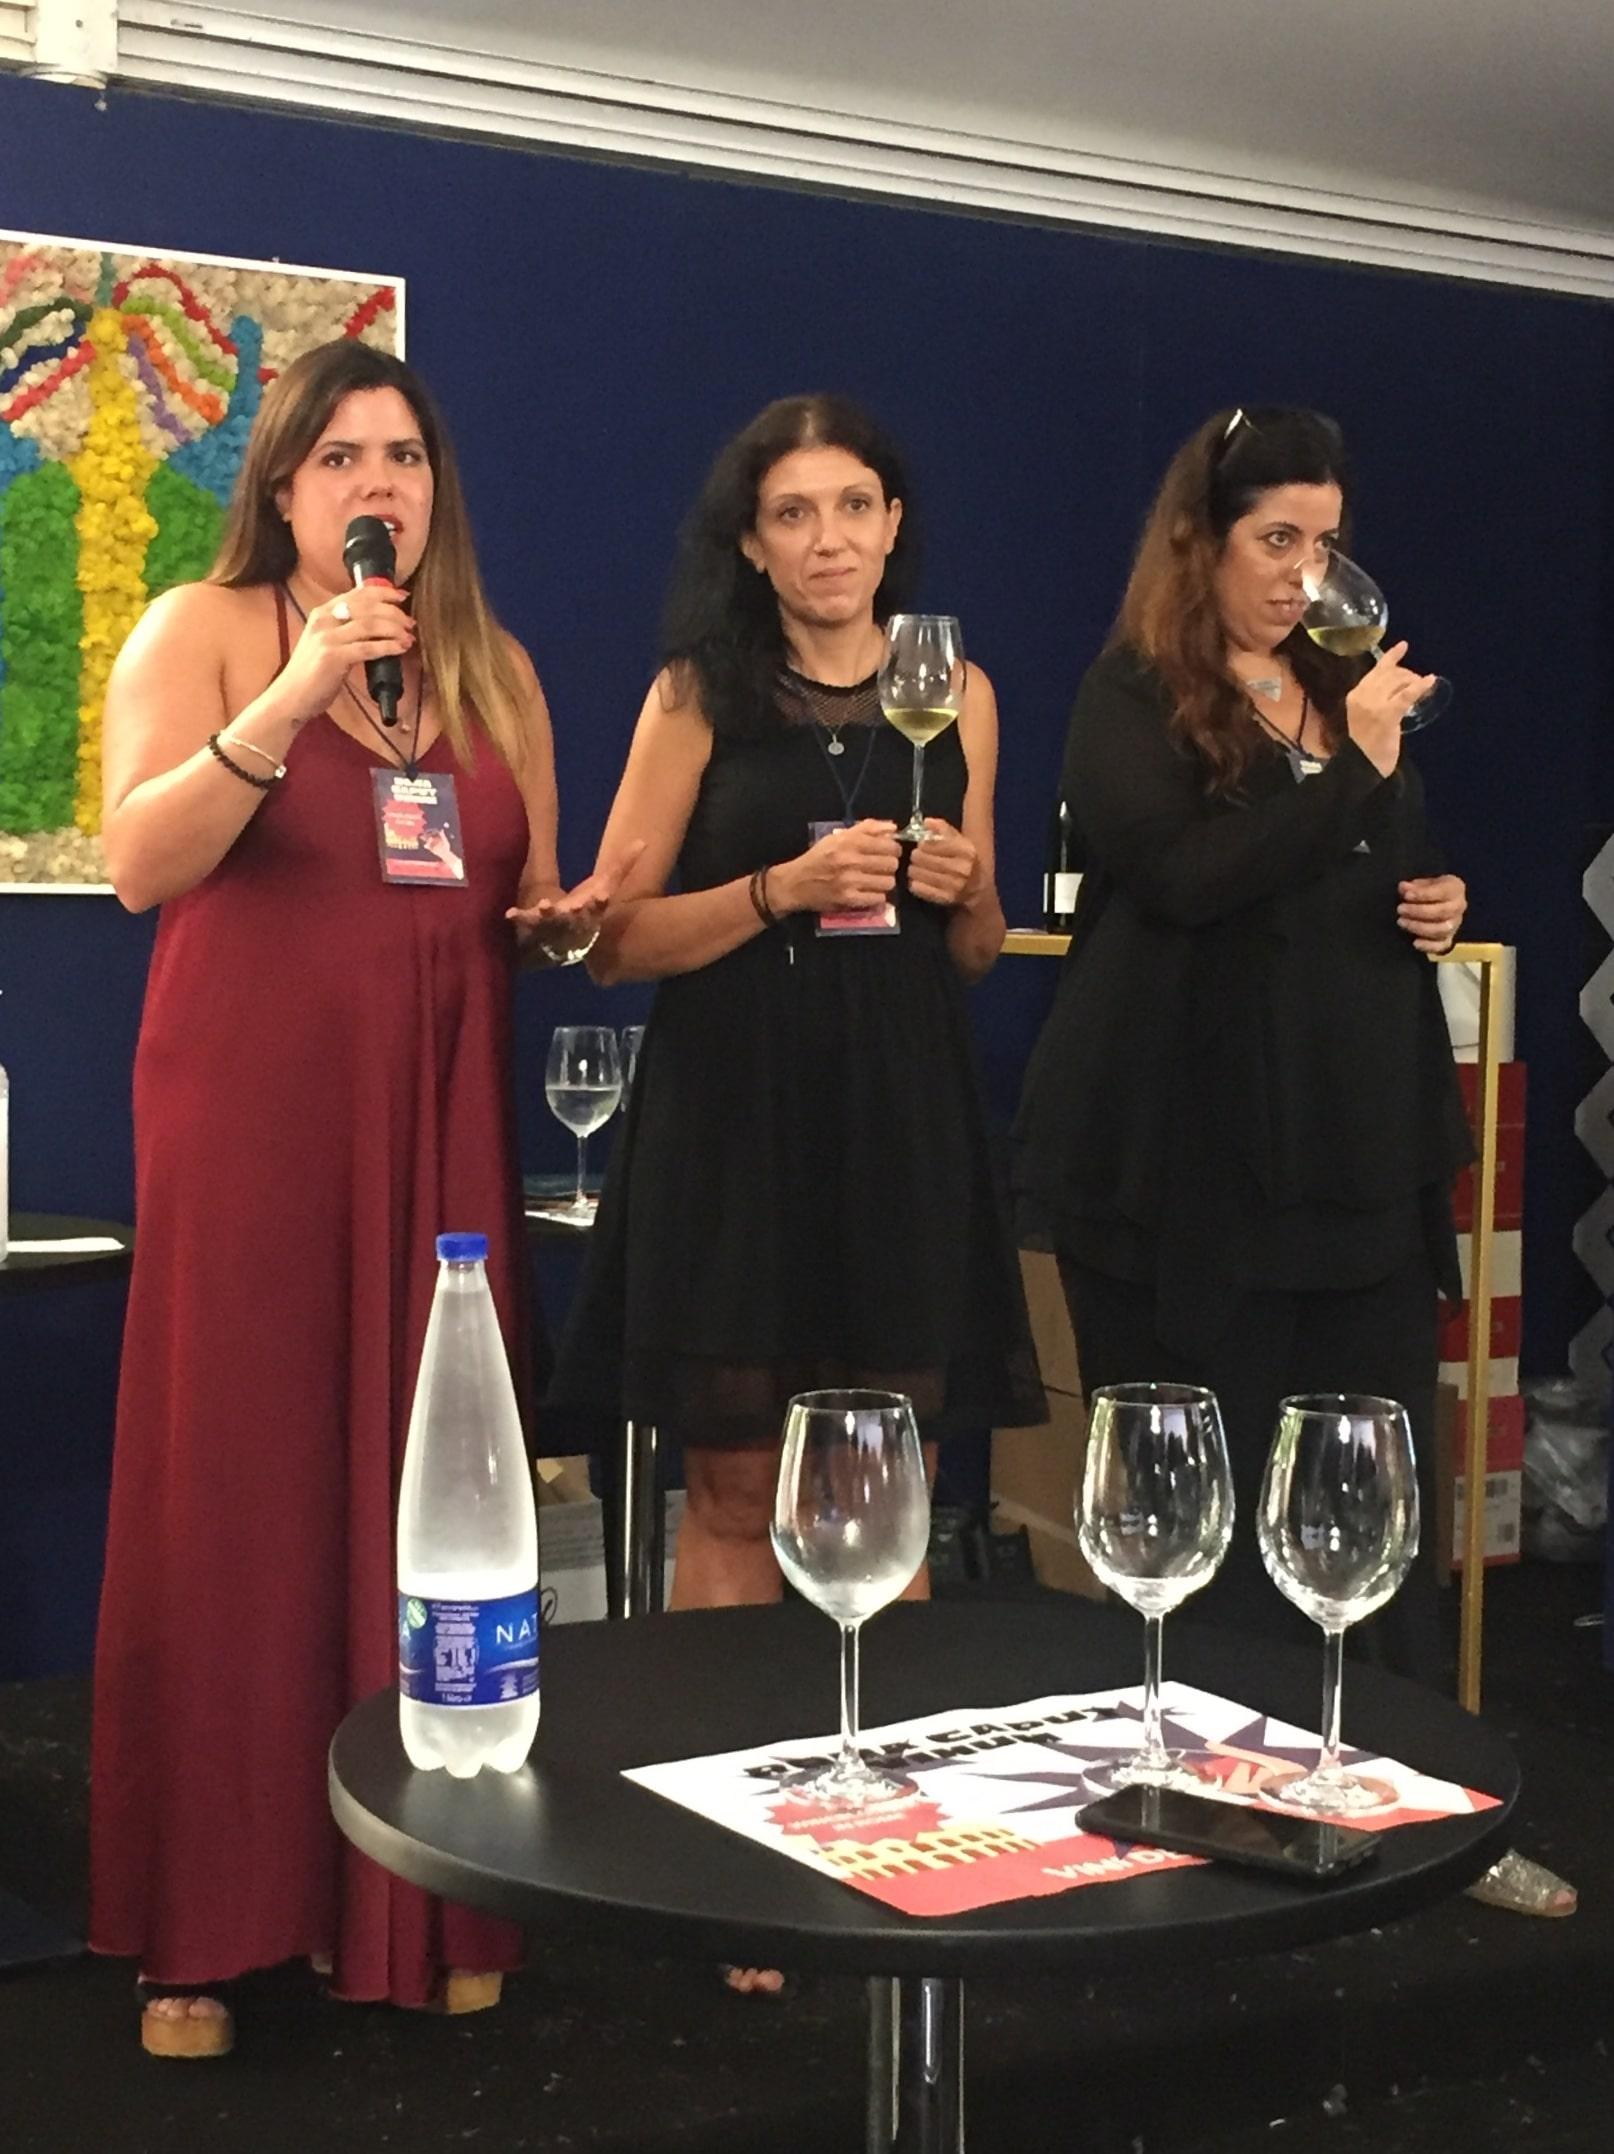 Vinoforum degustazione vini del lazio